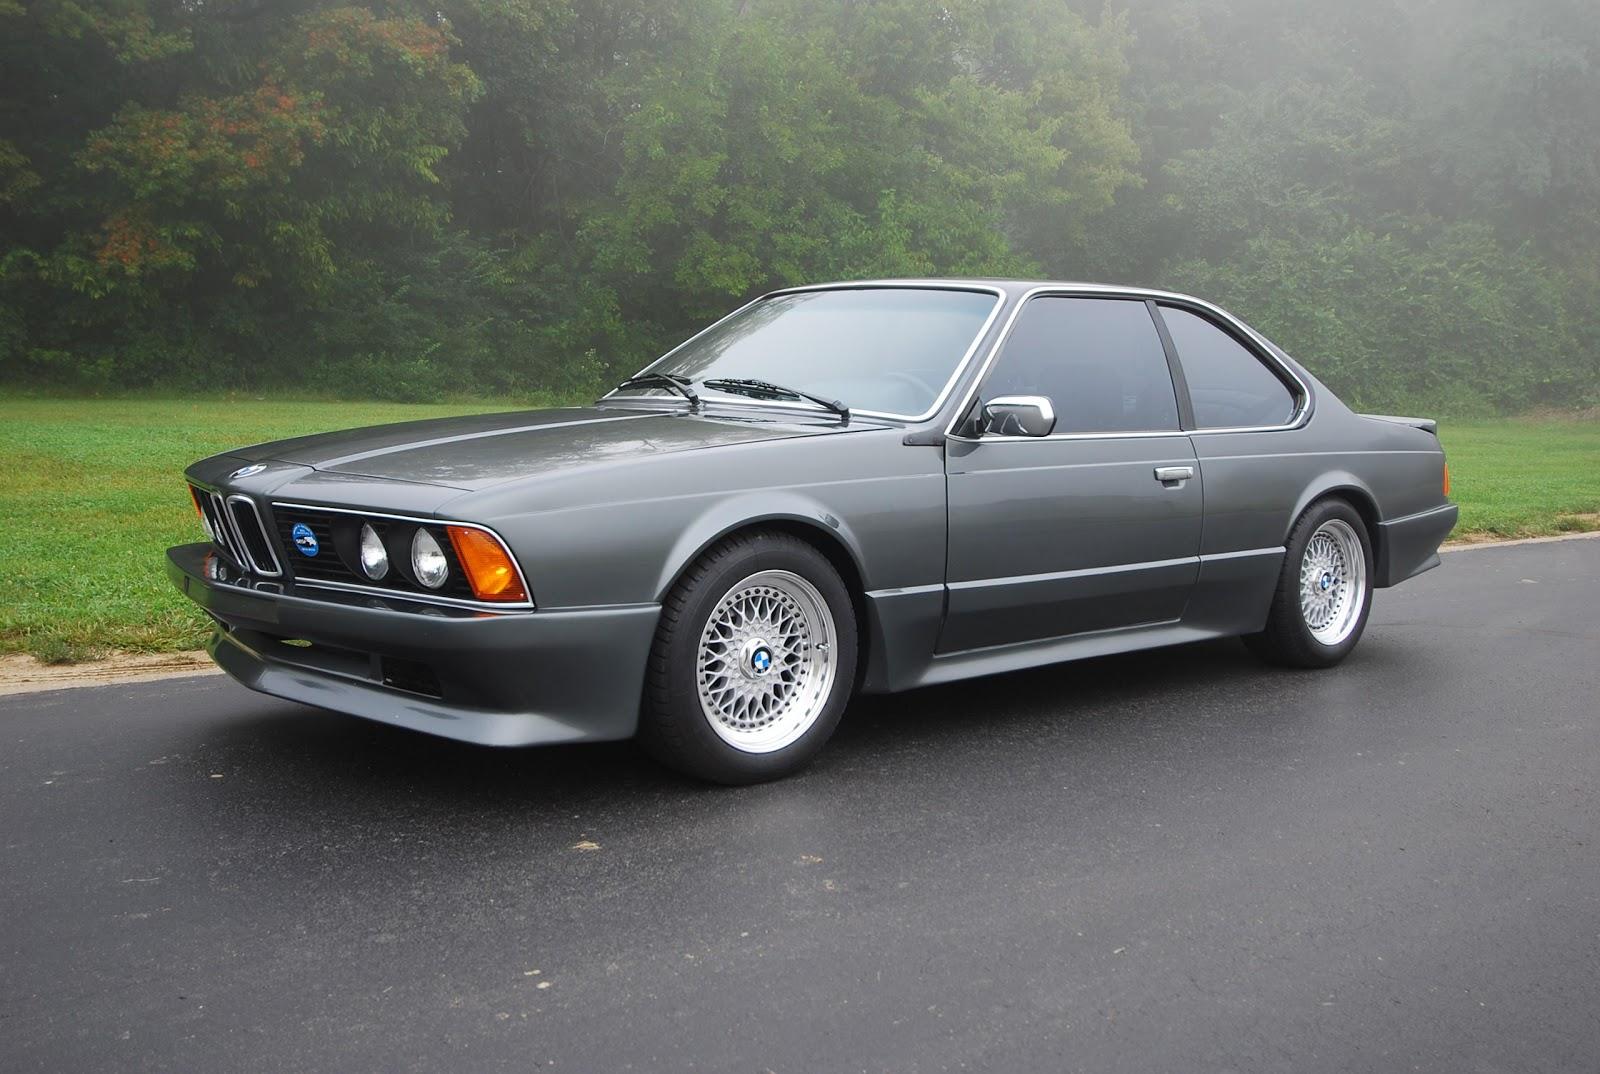 Bmw 635csi For Sale 1980 633csi